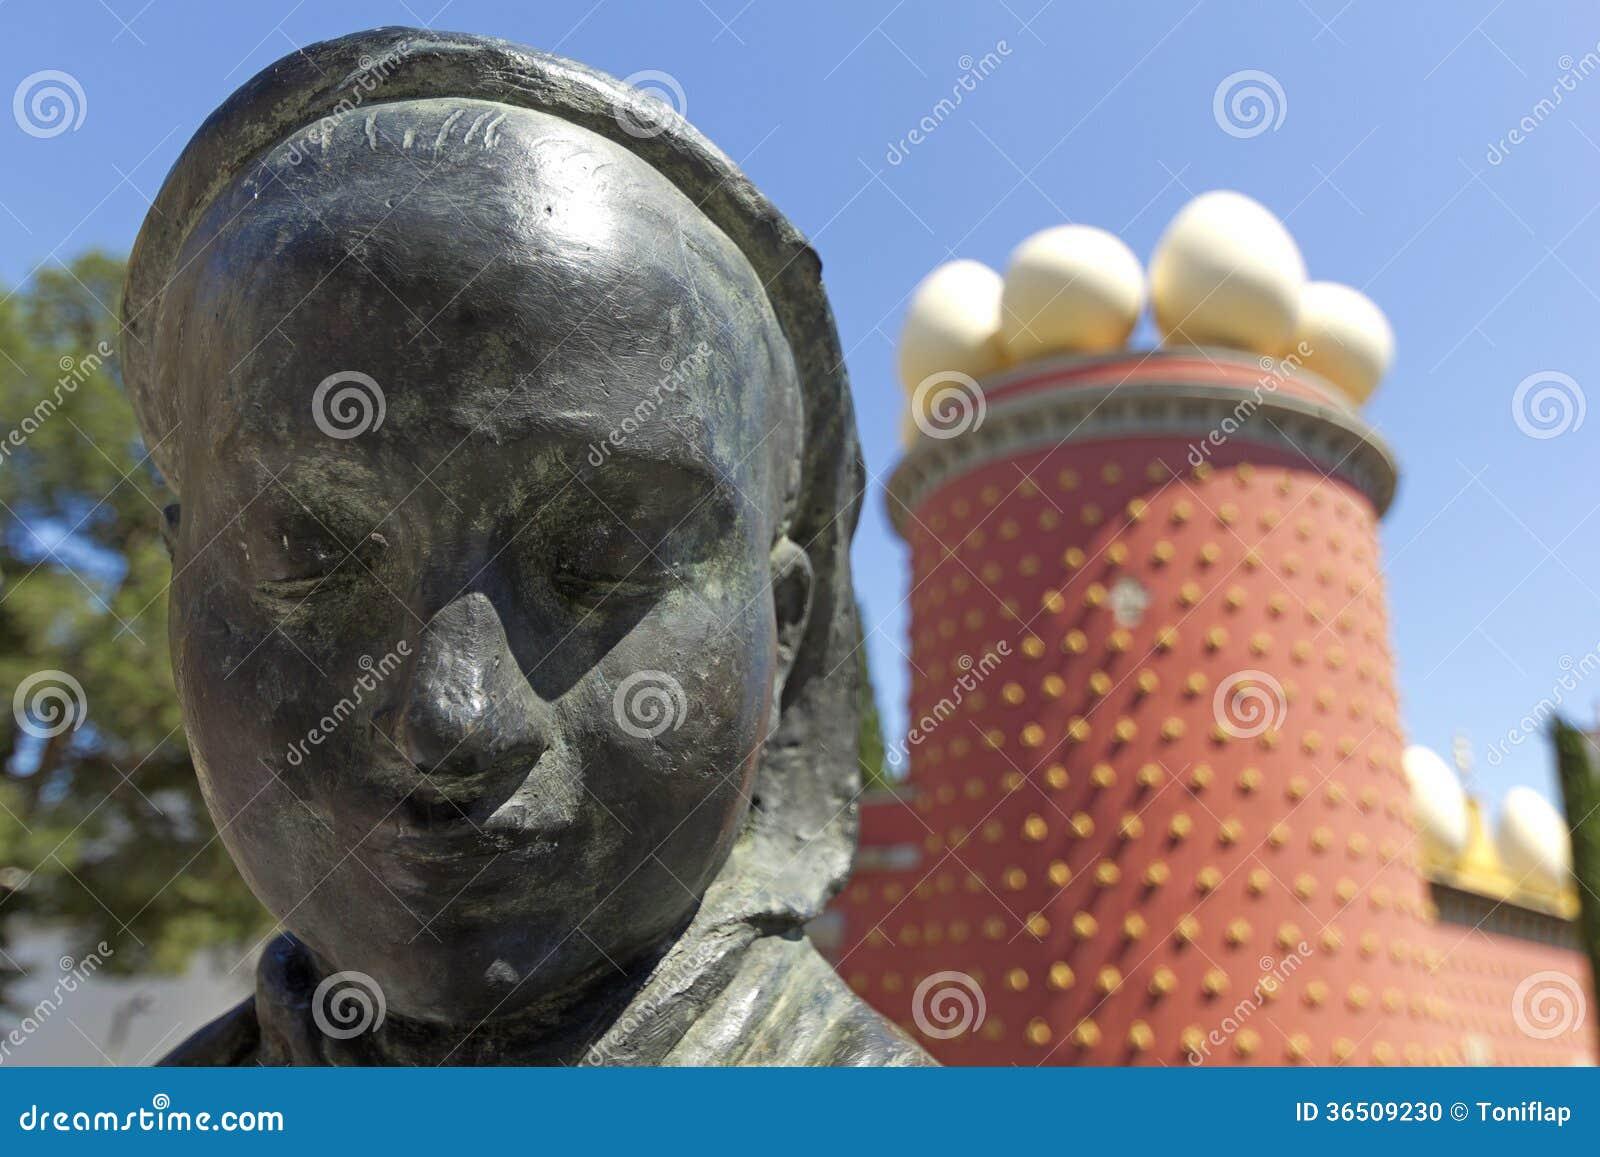 Statue et Dali Museum de Tramuntana. Figueres